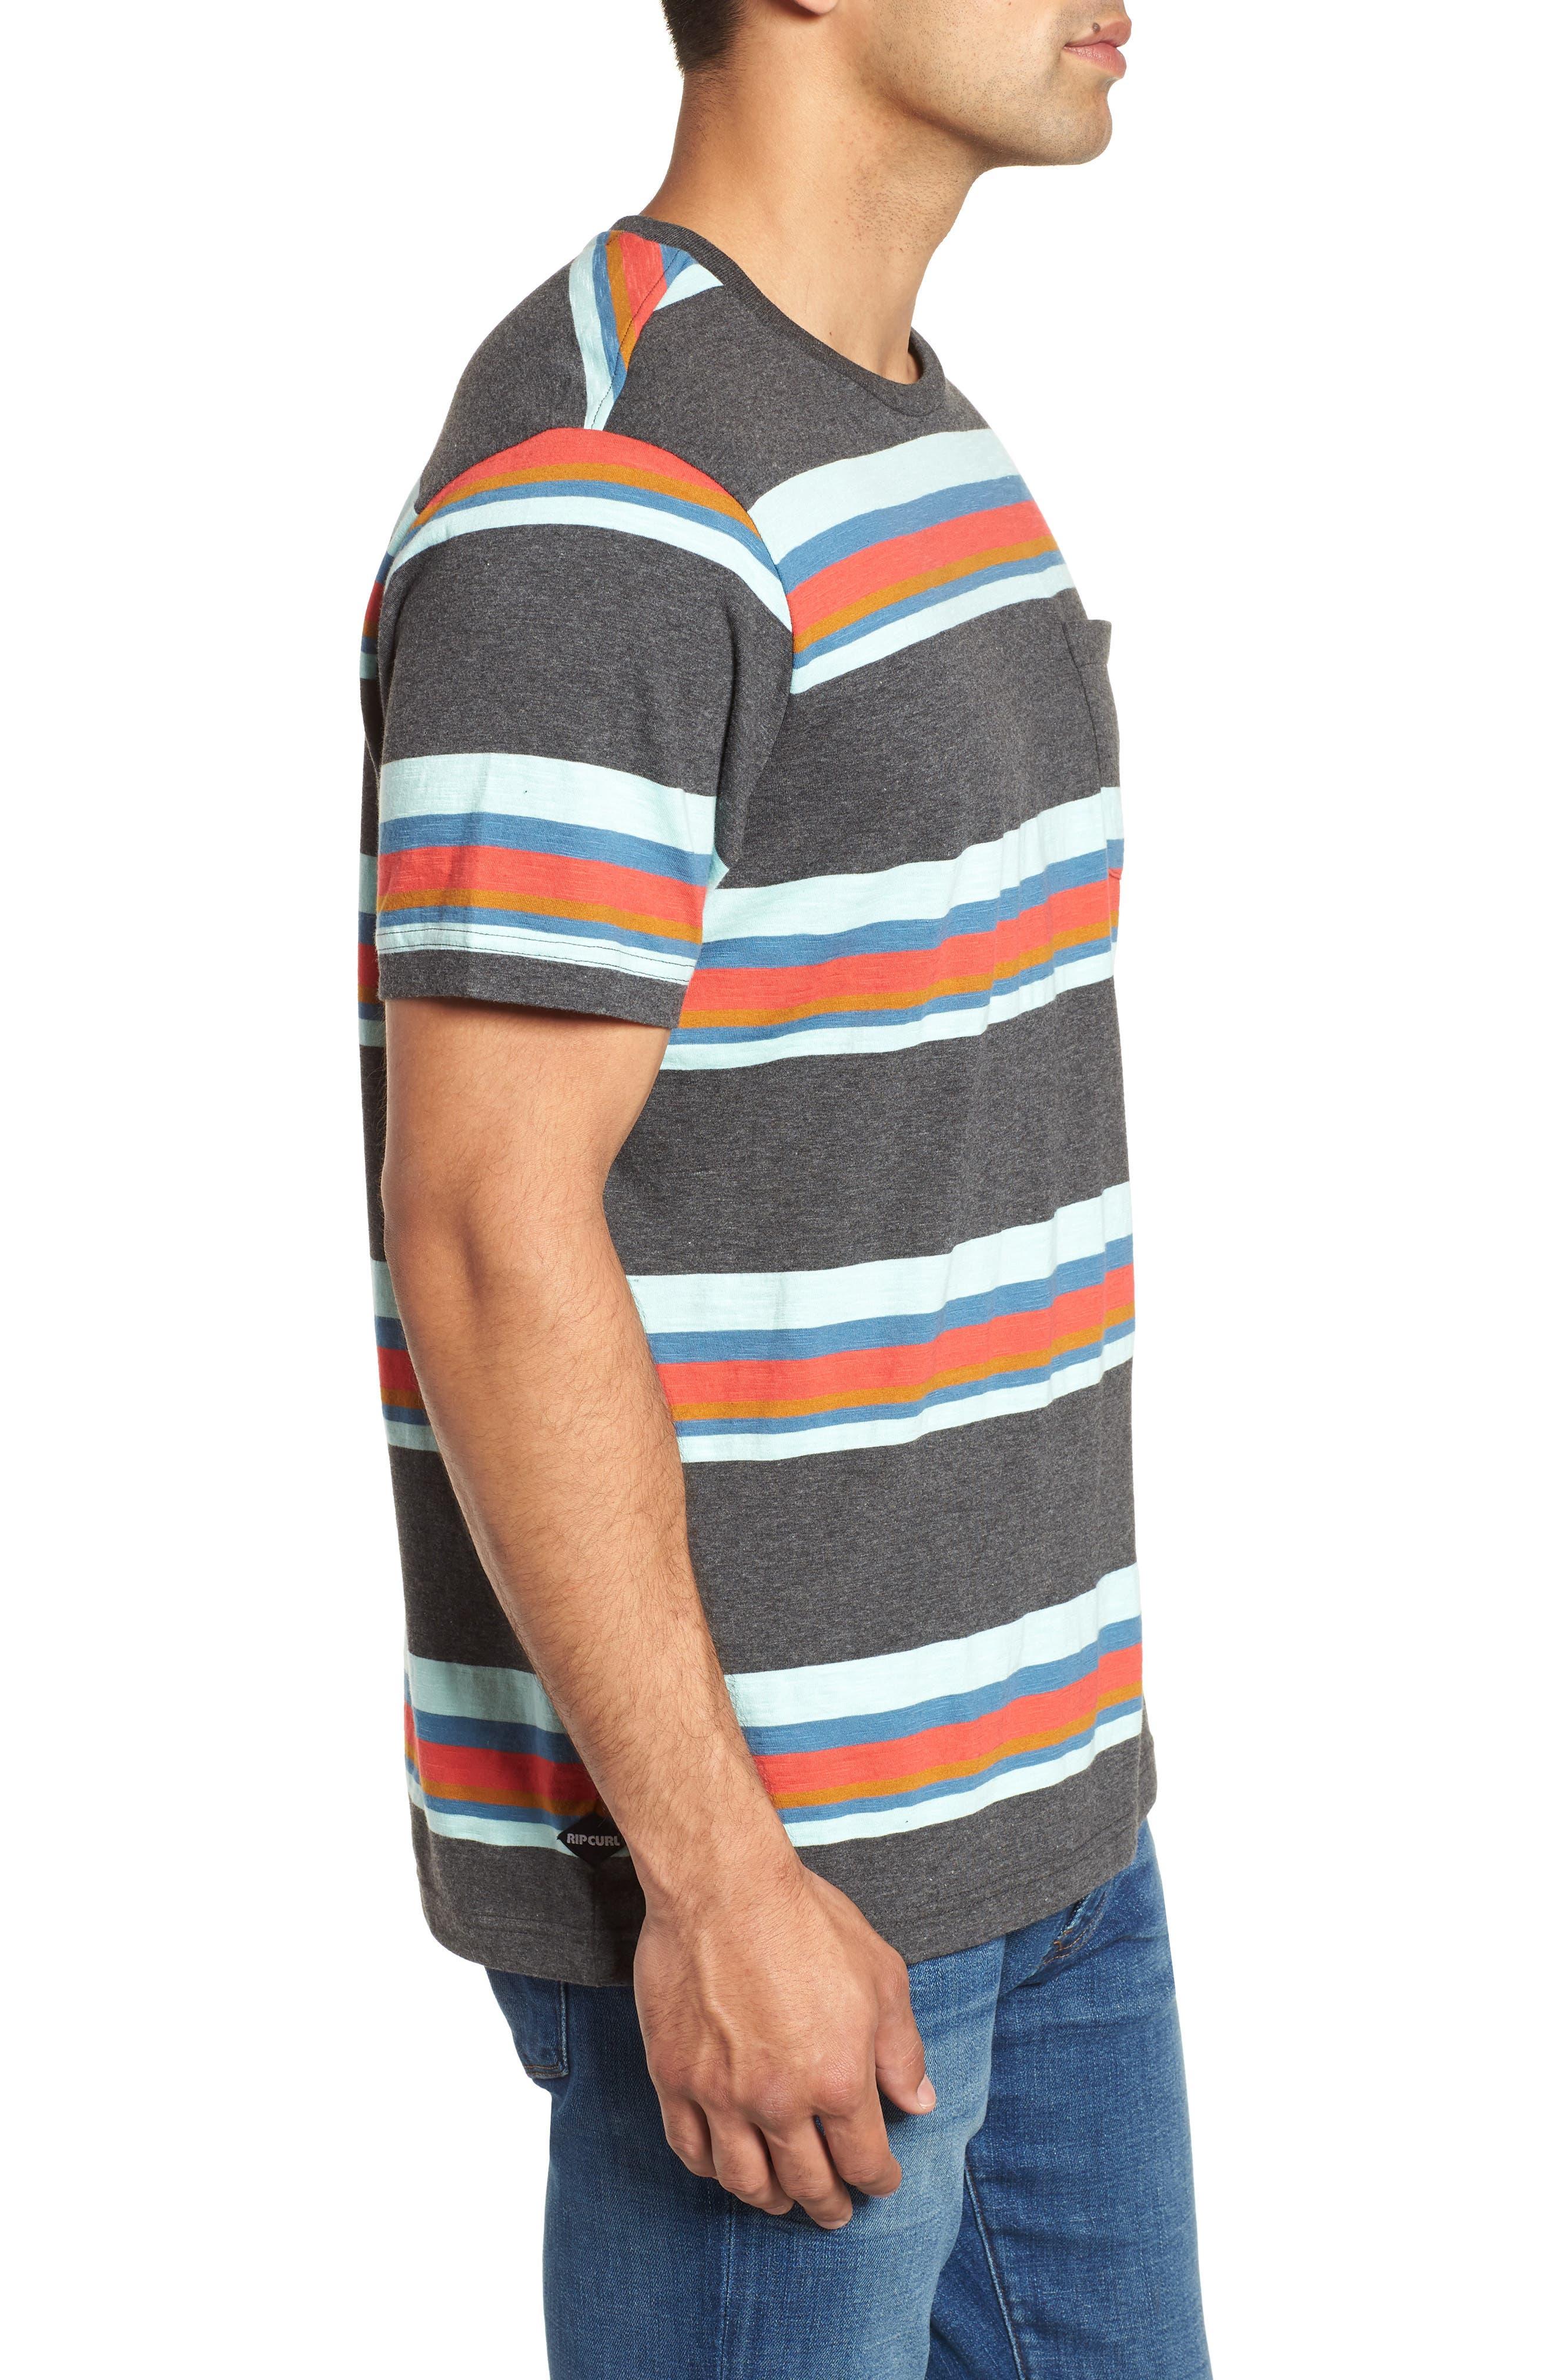 Prospect T-Shirt,                             Alternate thumbnail 3, color,                             020